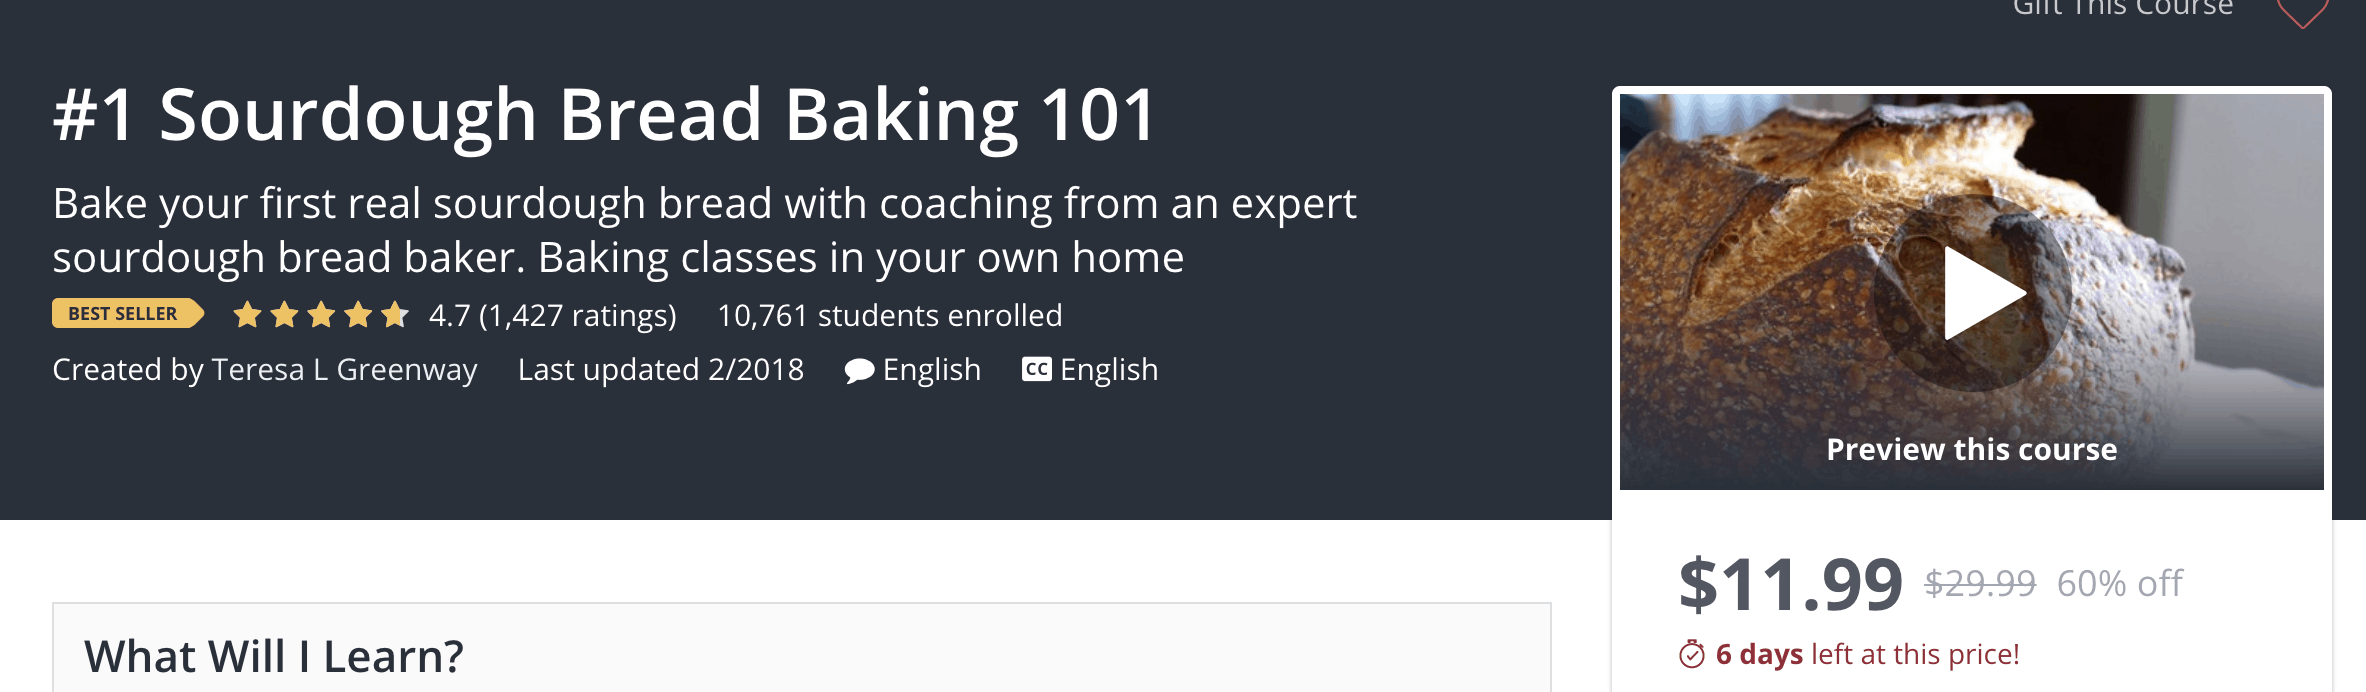 creating online course udemy sourdough bread